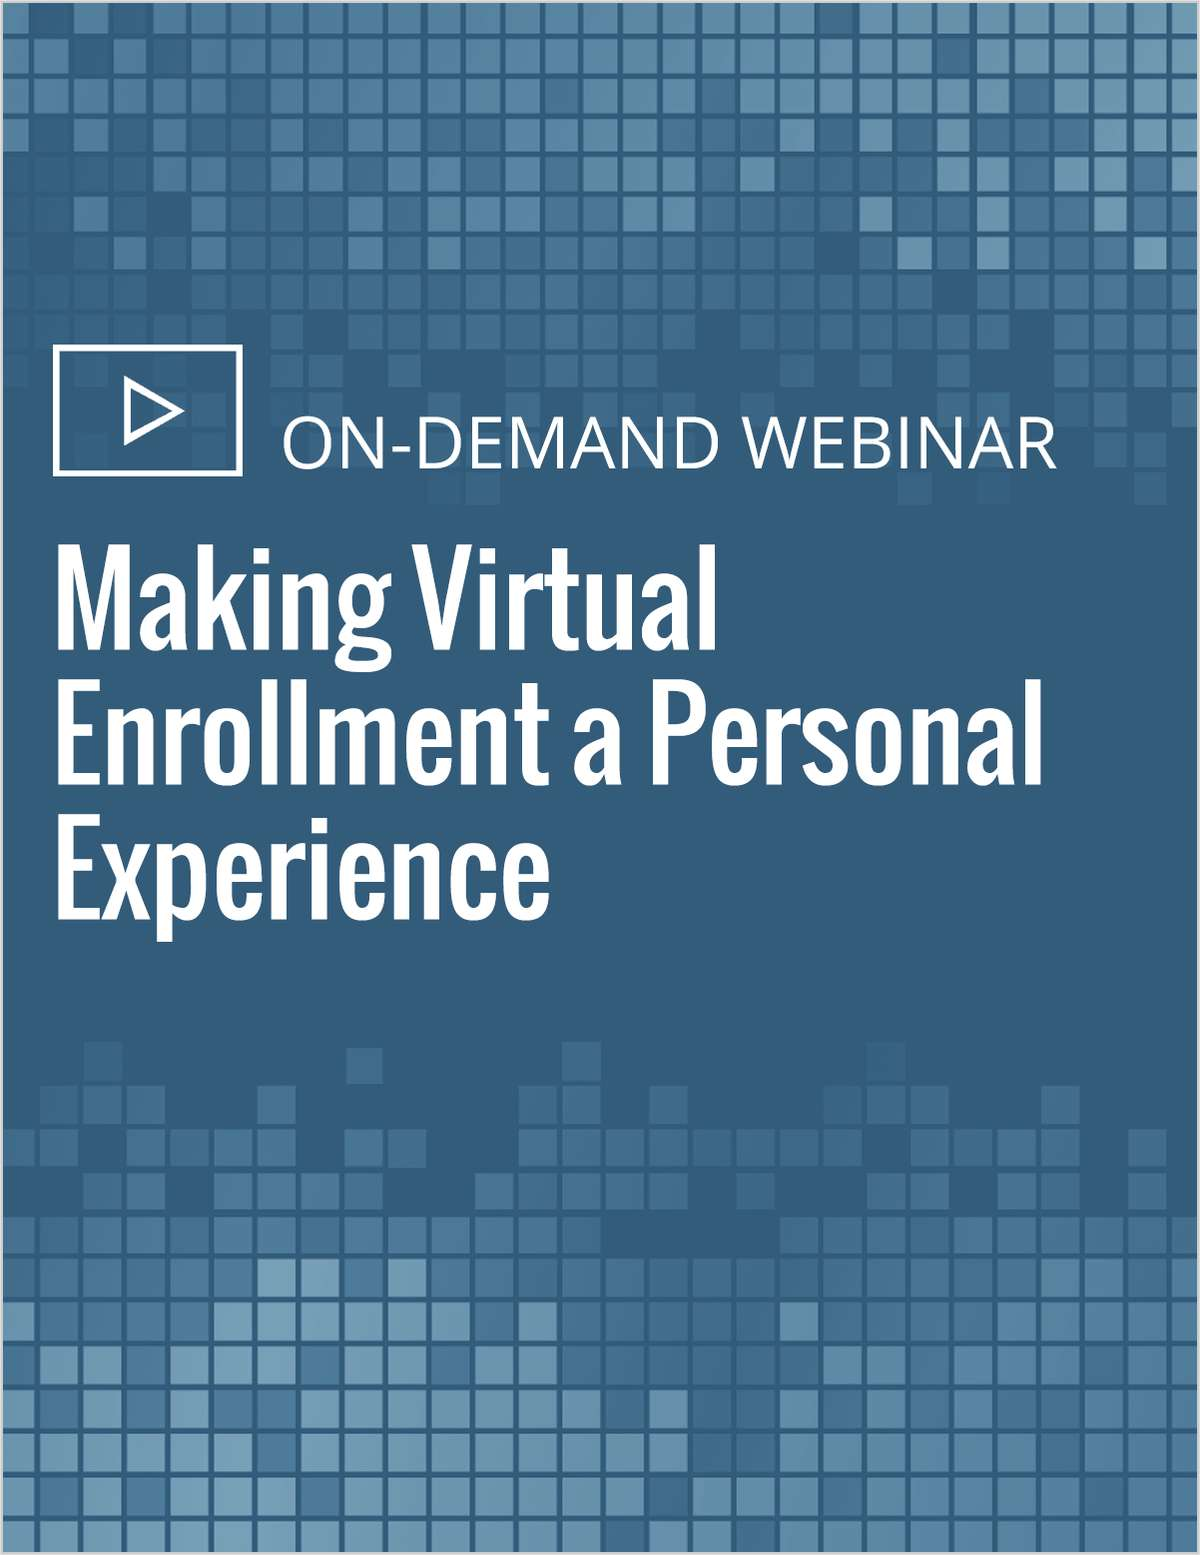 Making Virtual Enrollment a Personal Experience